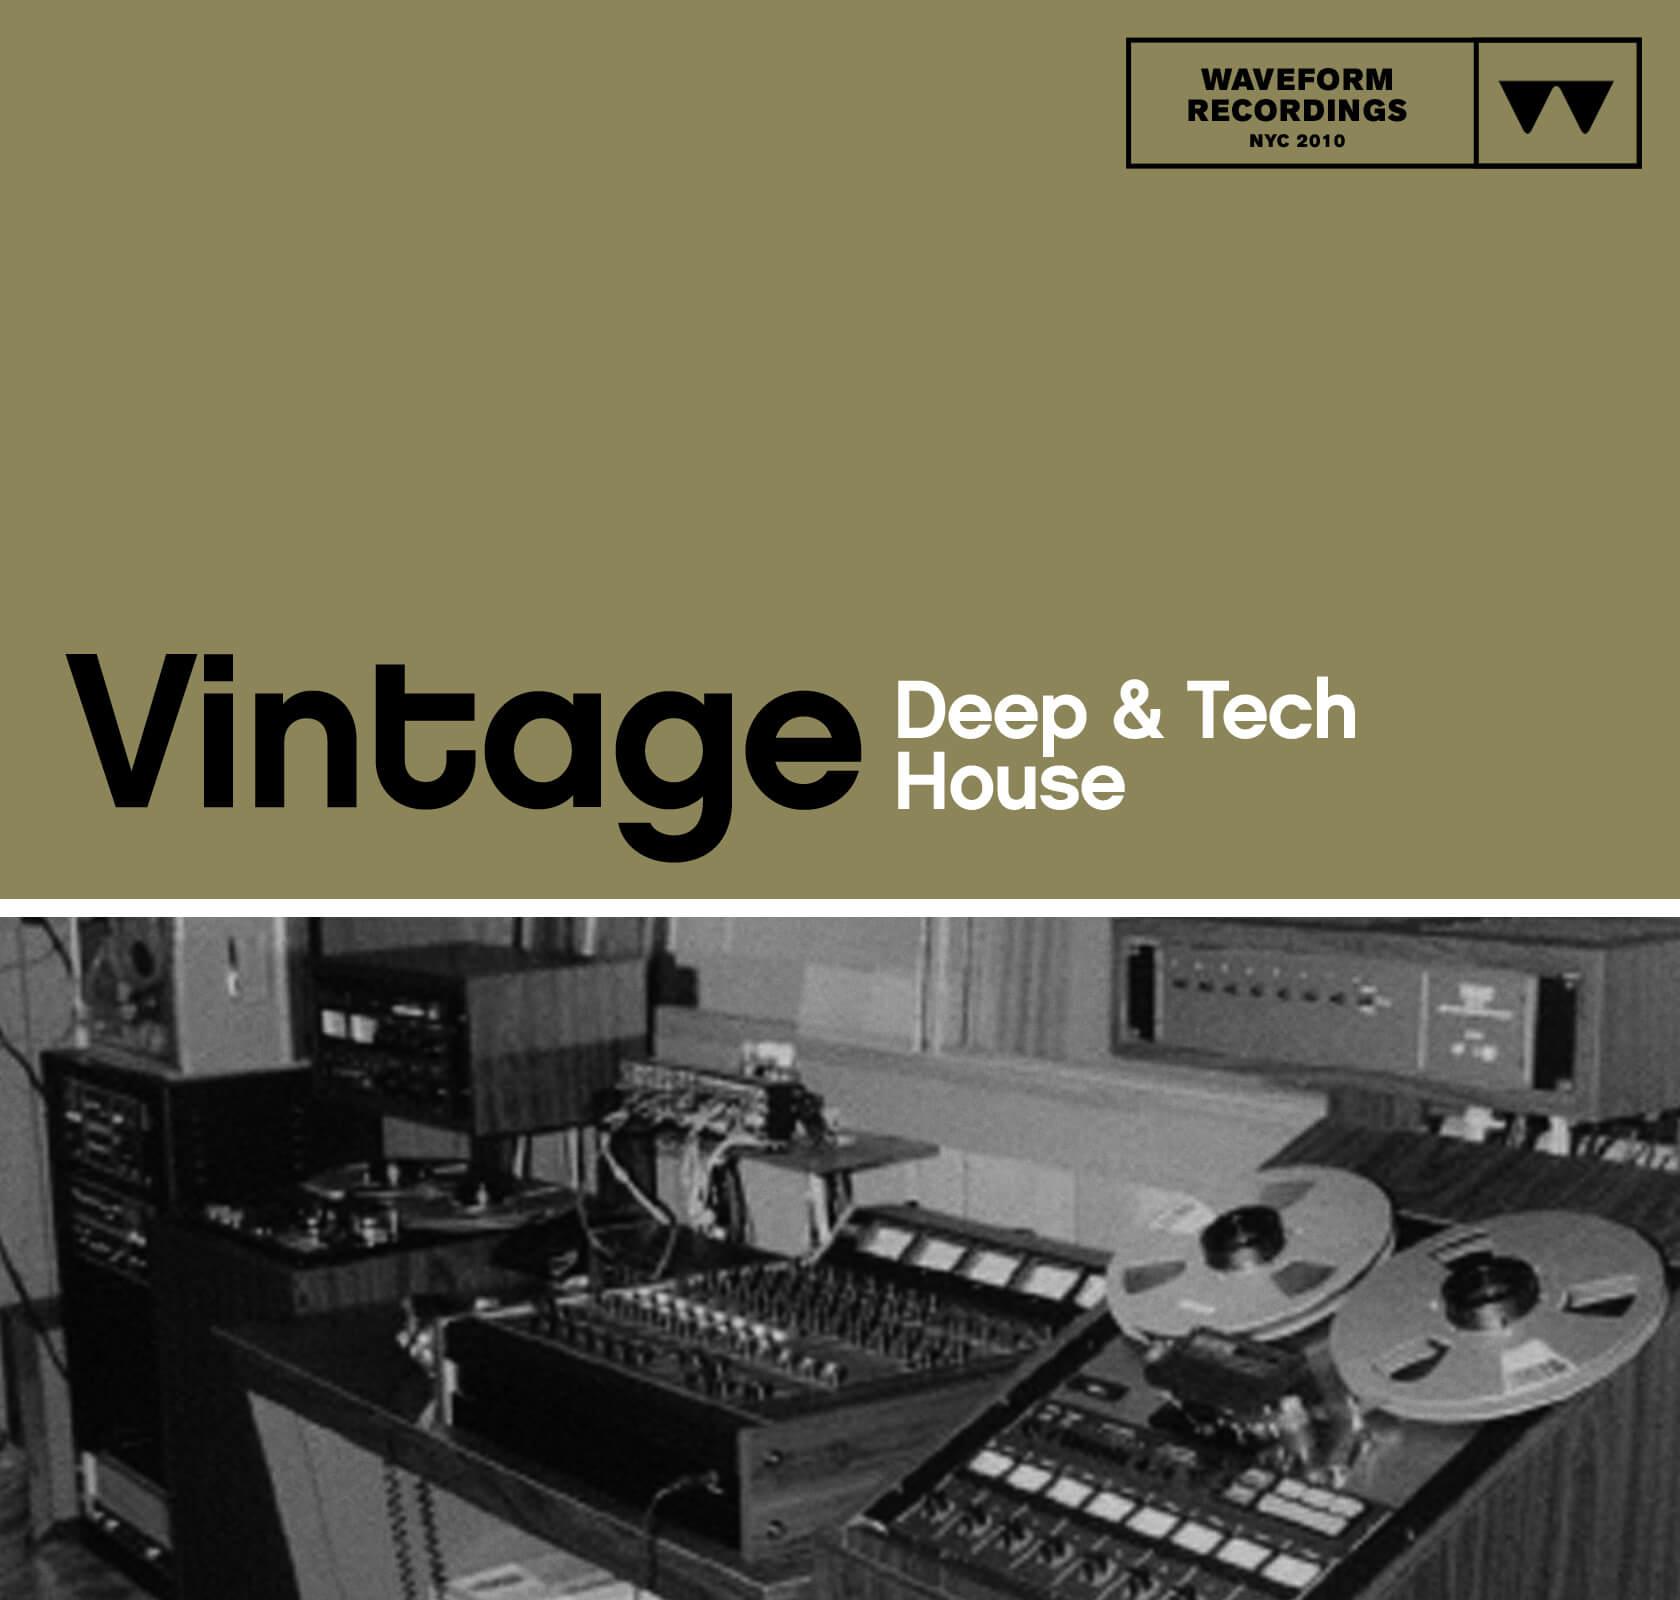 Vintage Deep & Tech House